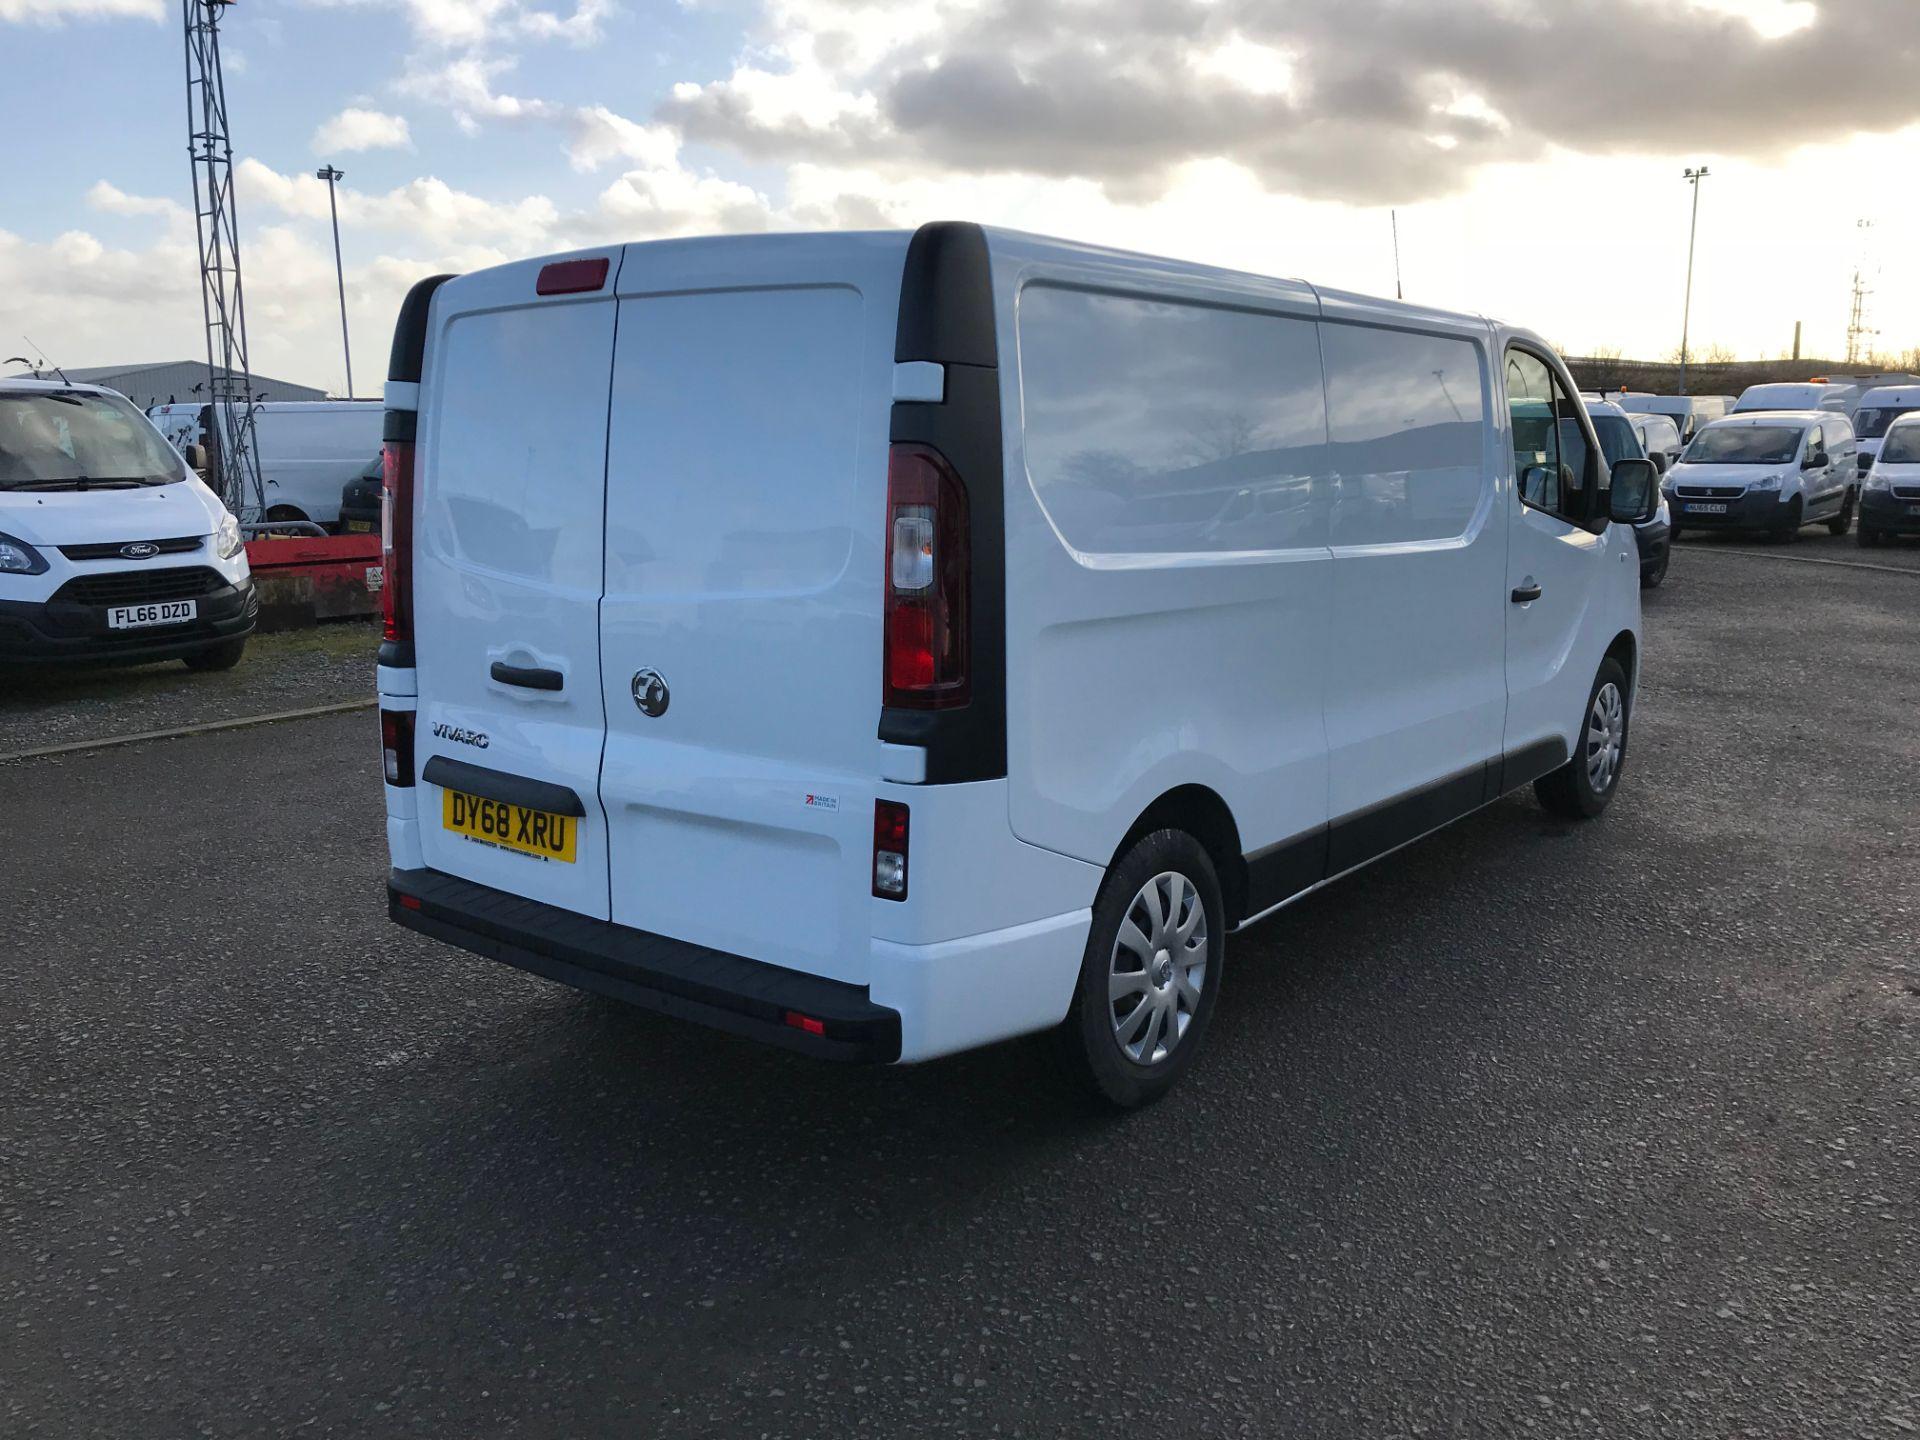 2018 Vauxhall Vivaro 2900 1.6Cdti 120Ps Sportive H1 Van (DY68XRU) Image 7